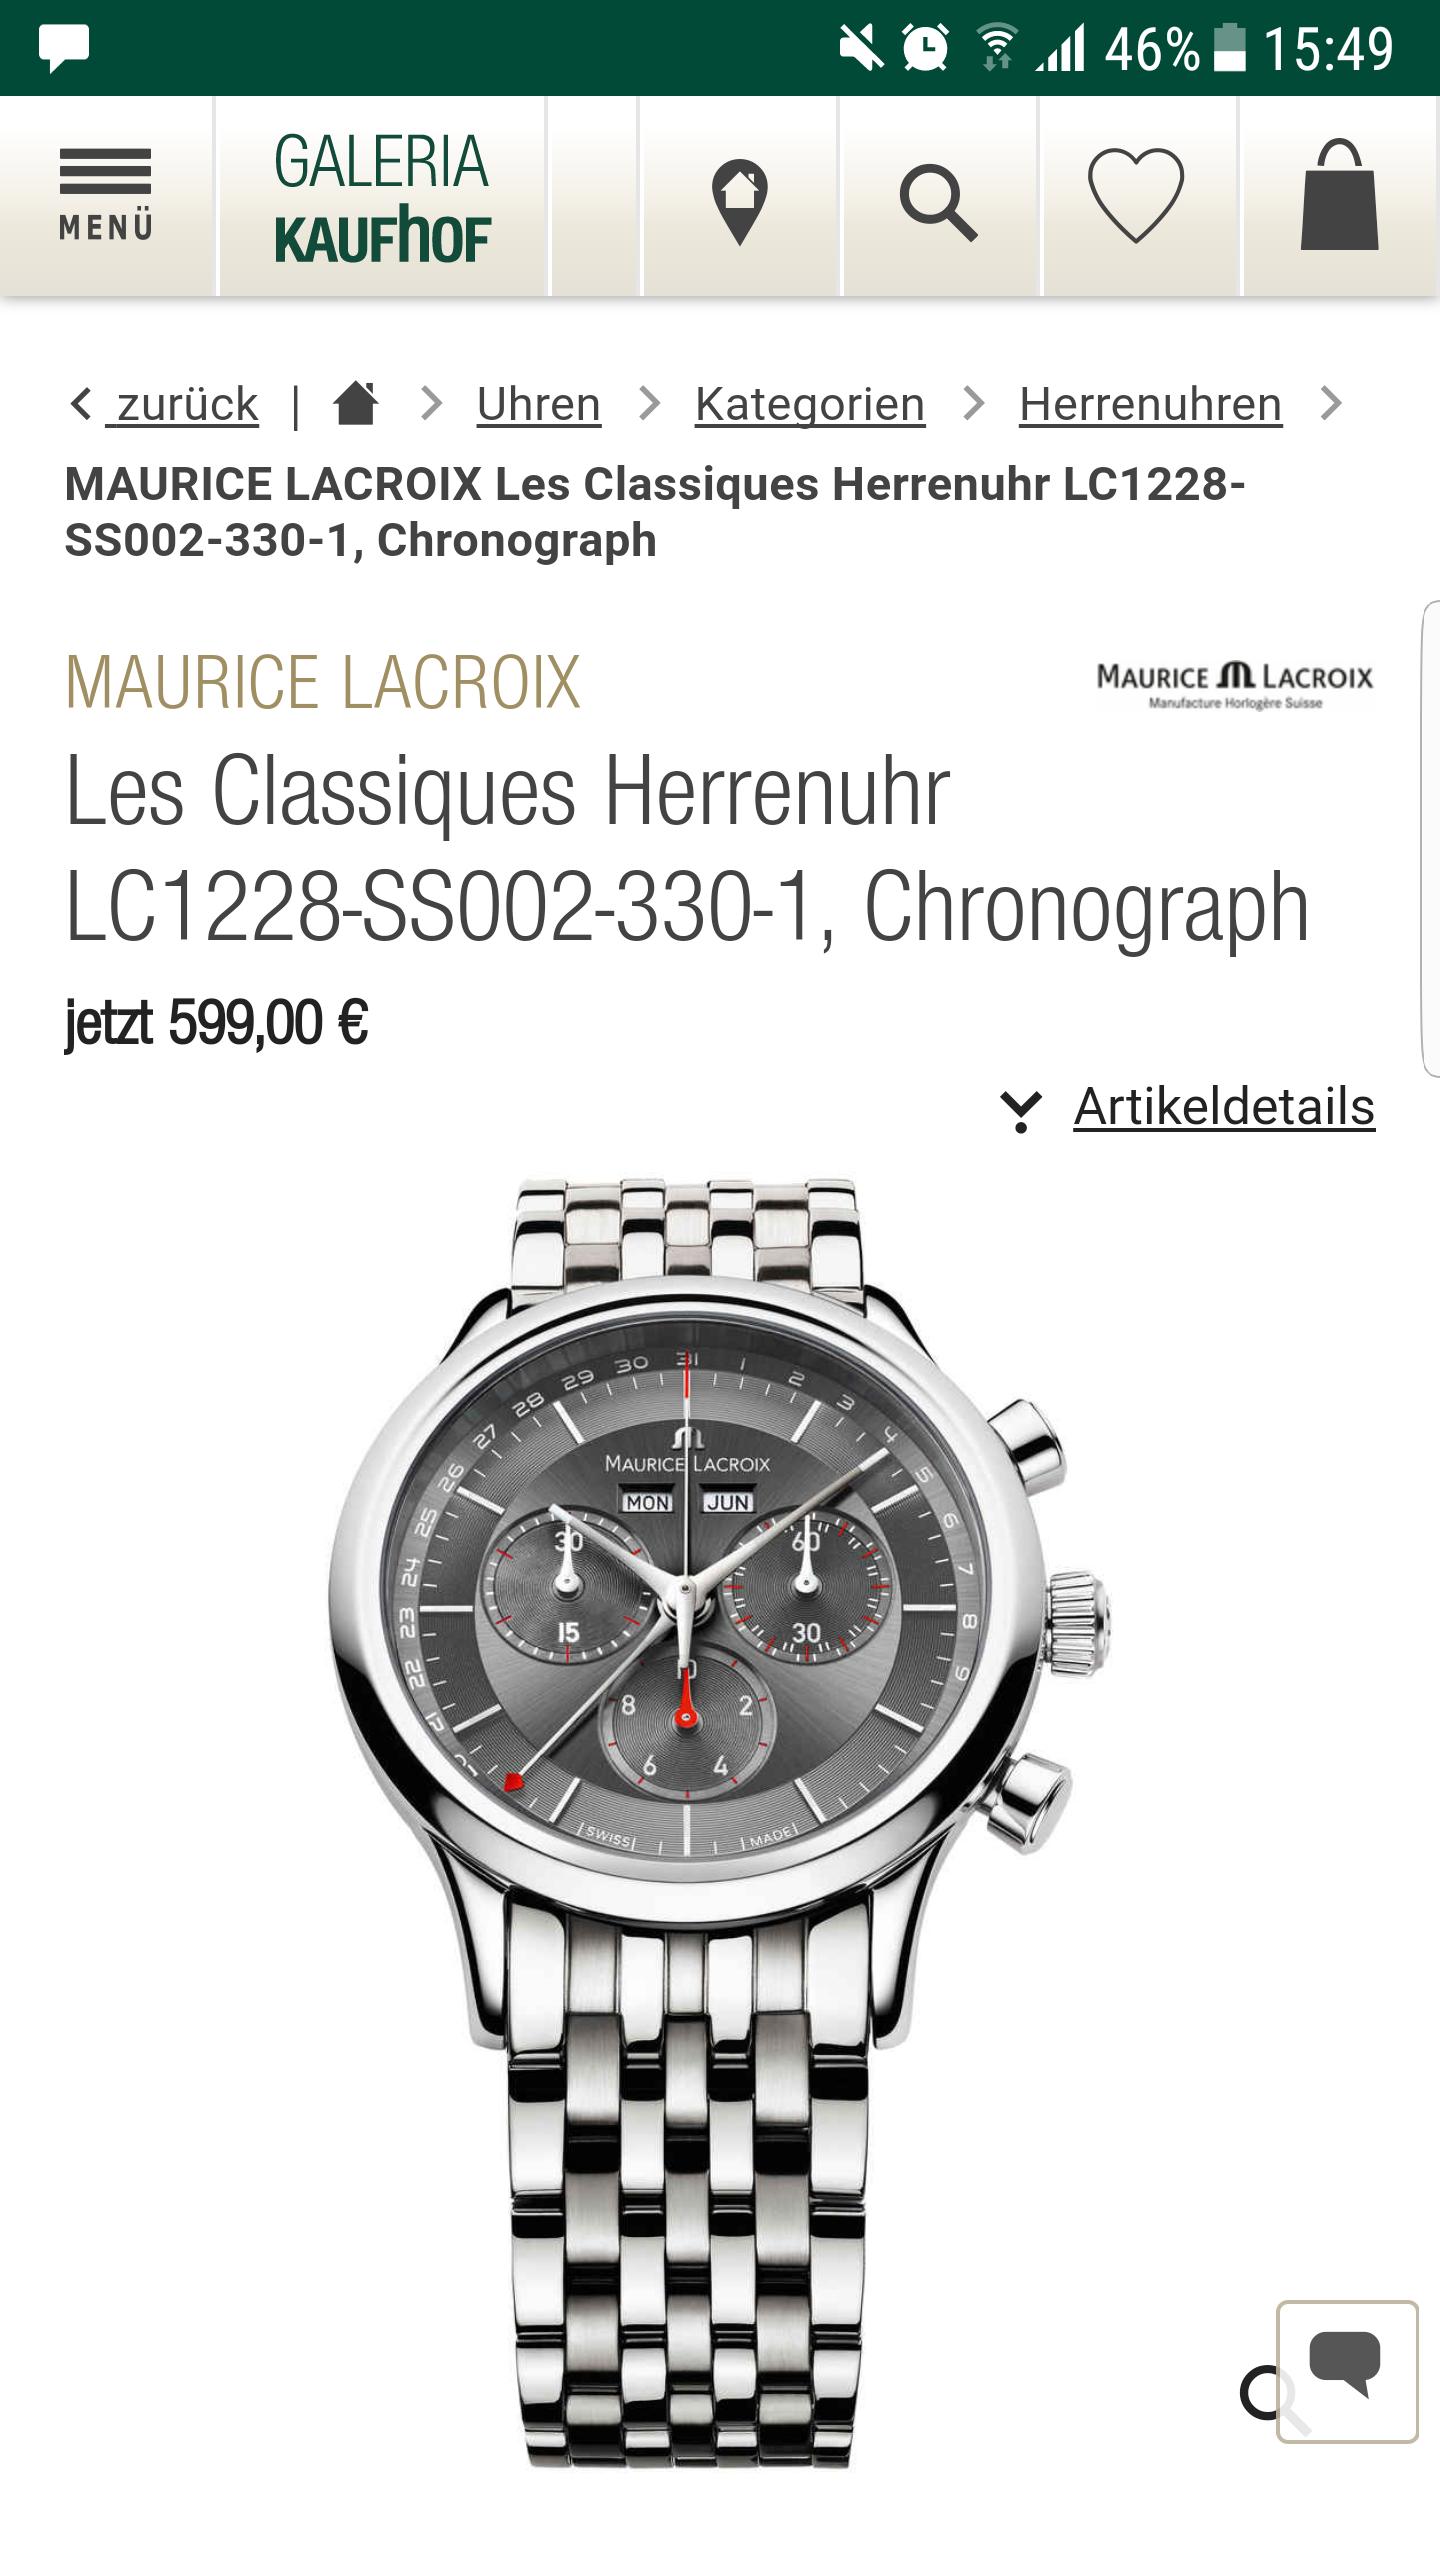 MAURICE LACROIX Les Classiques Herrenuhr LC1228-SS002-330-1, Chronograph [Galeria Kaufhof] Versandkostenfrei